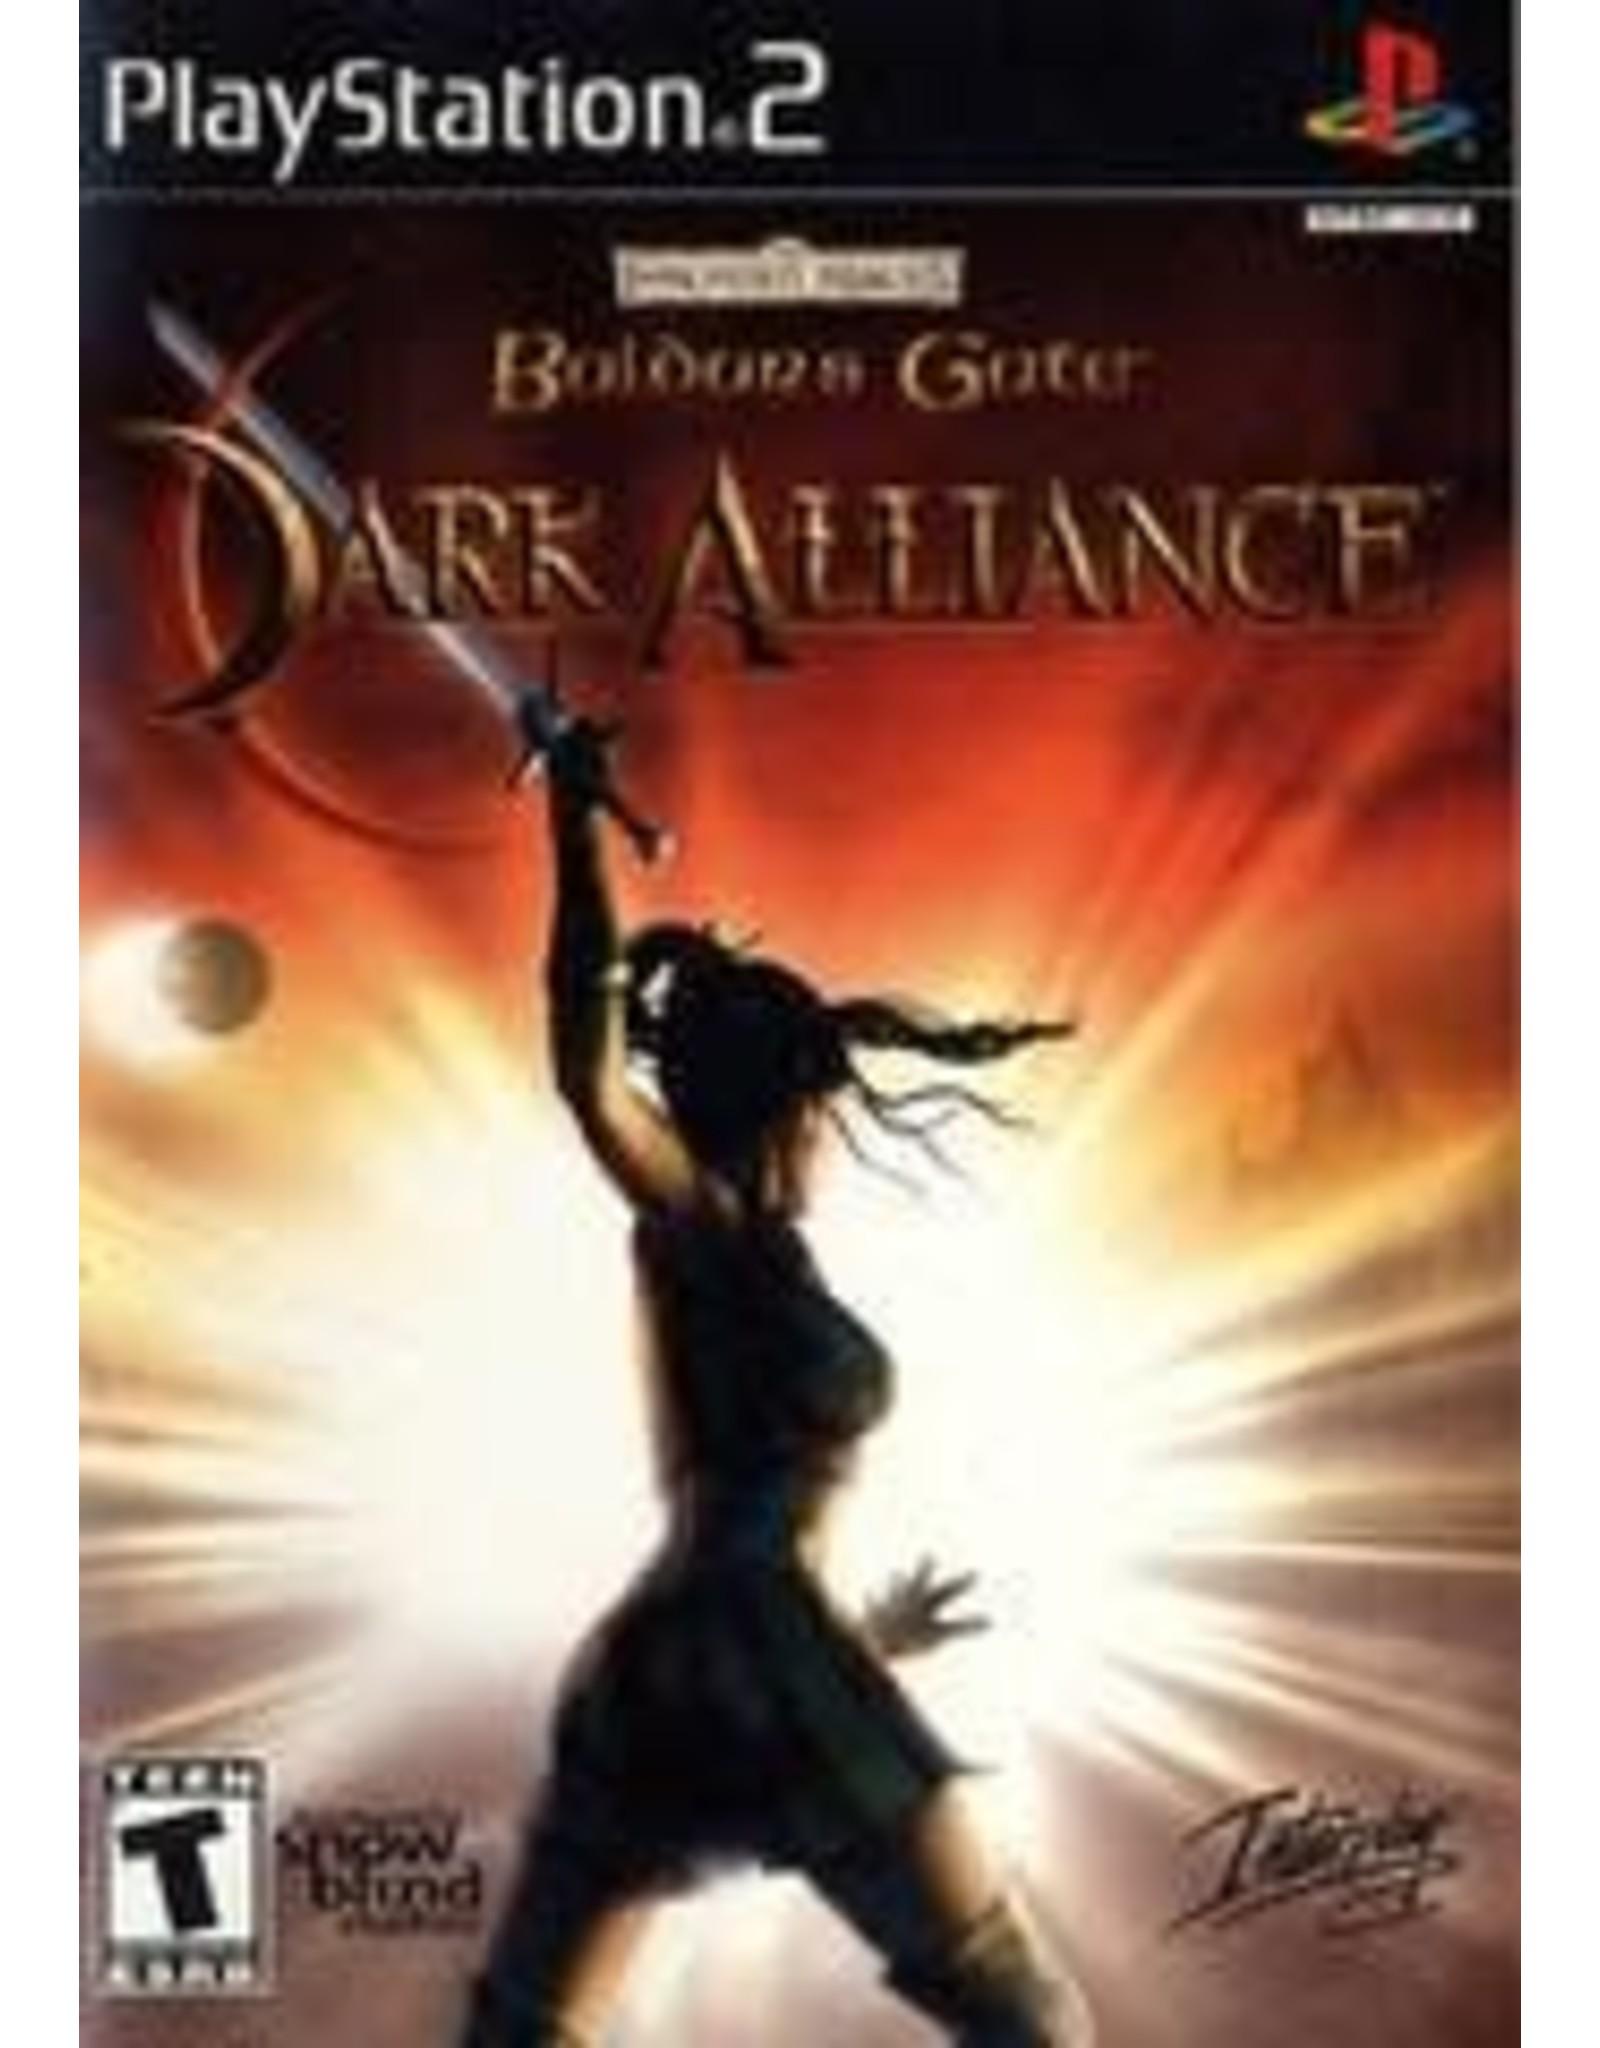 Playstation 2 Baldur's Gate Dark Alliance (CiB)